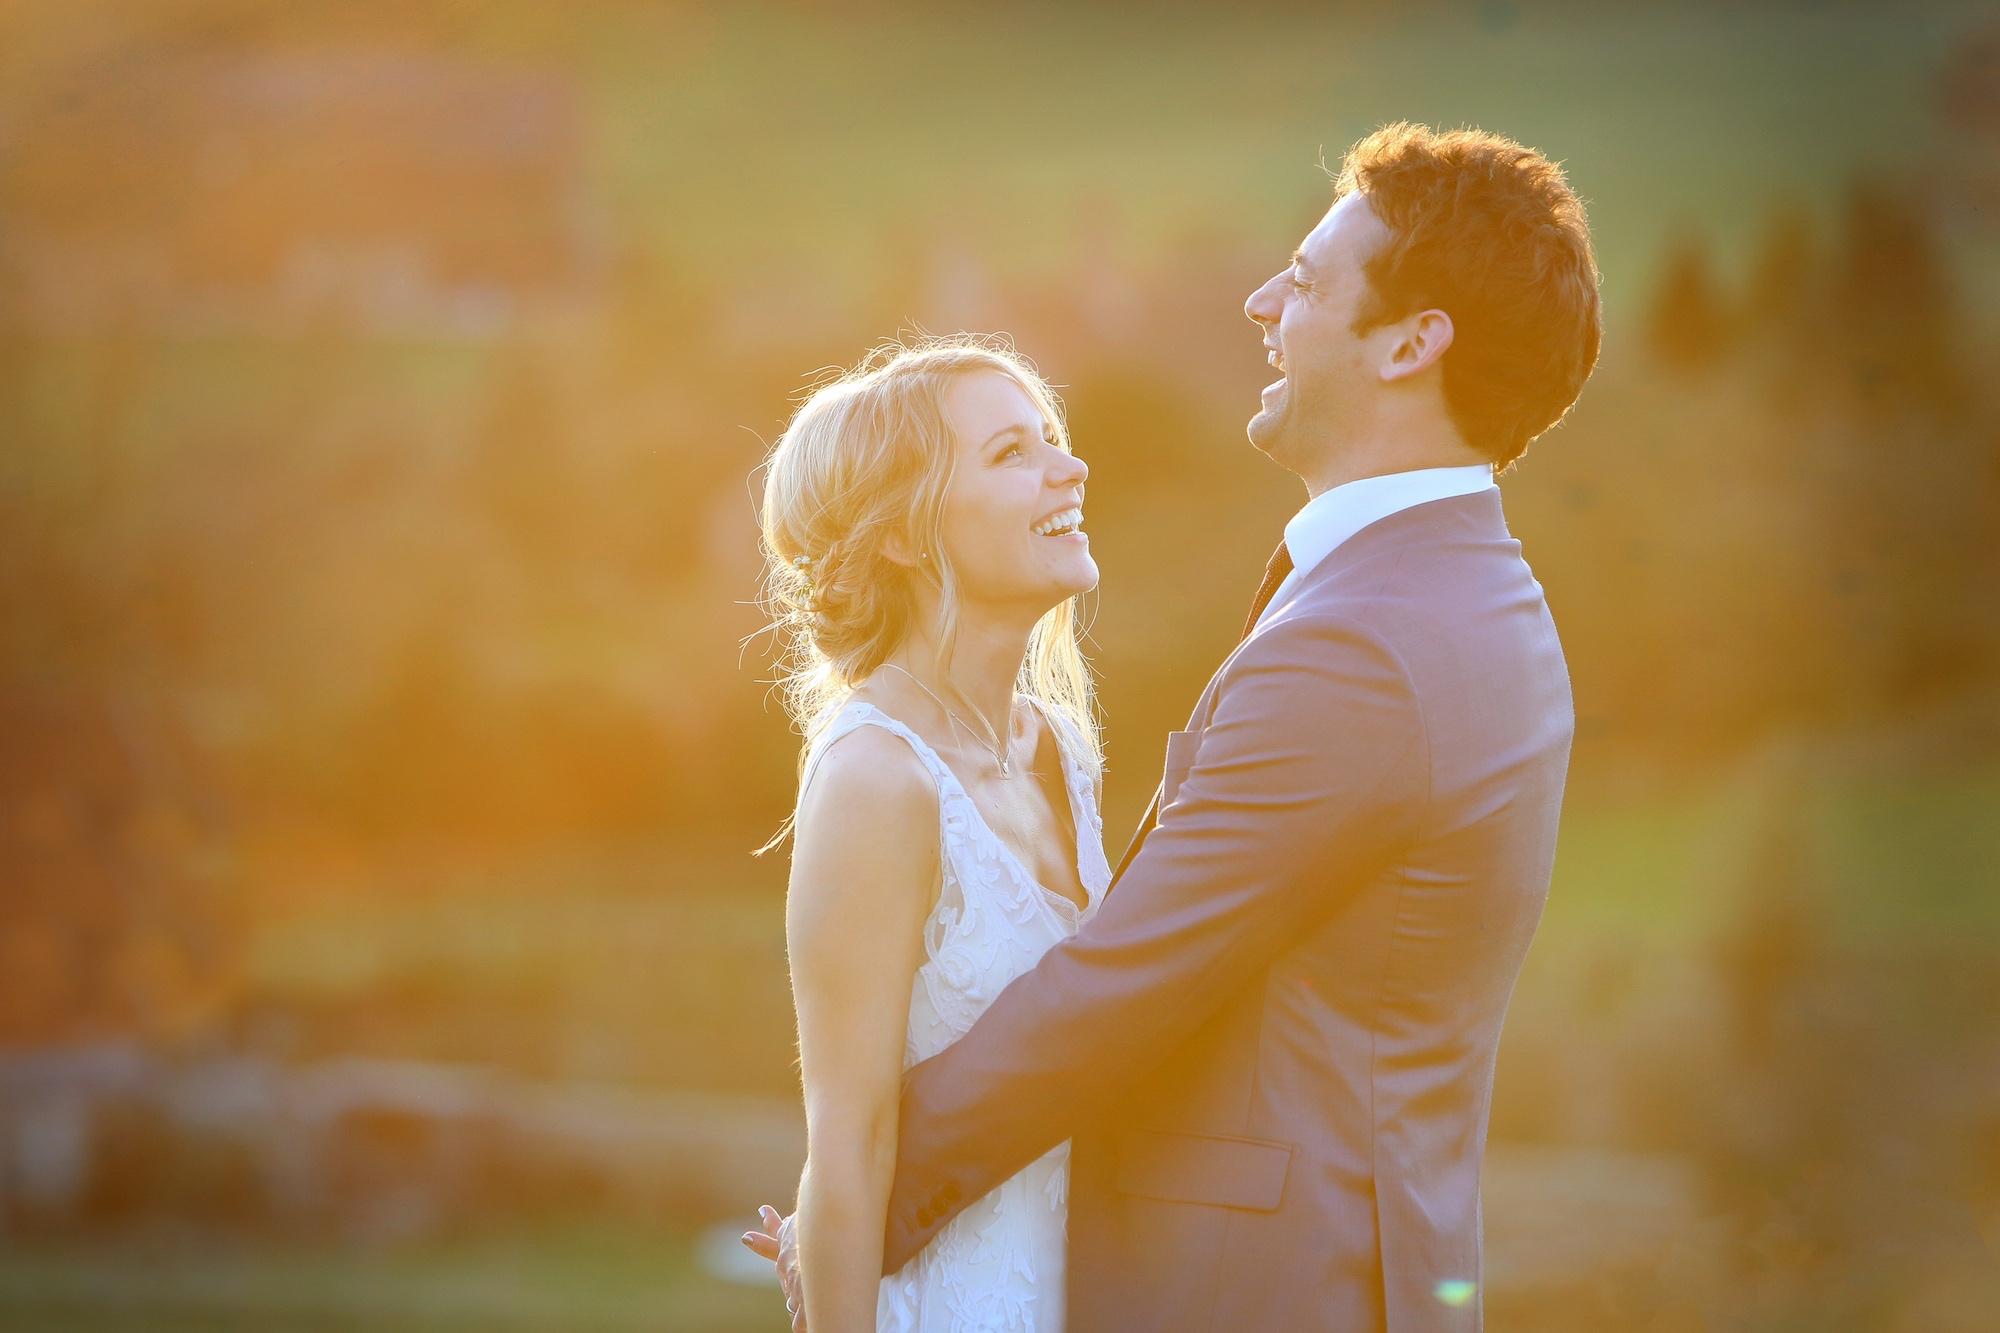 candid wedding photographer sussex golden hour